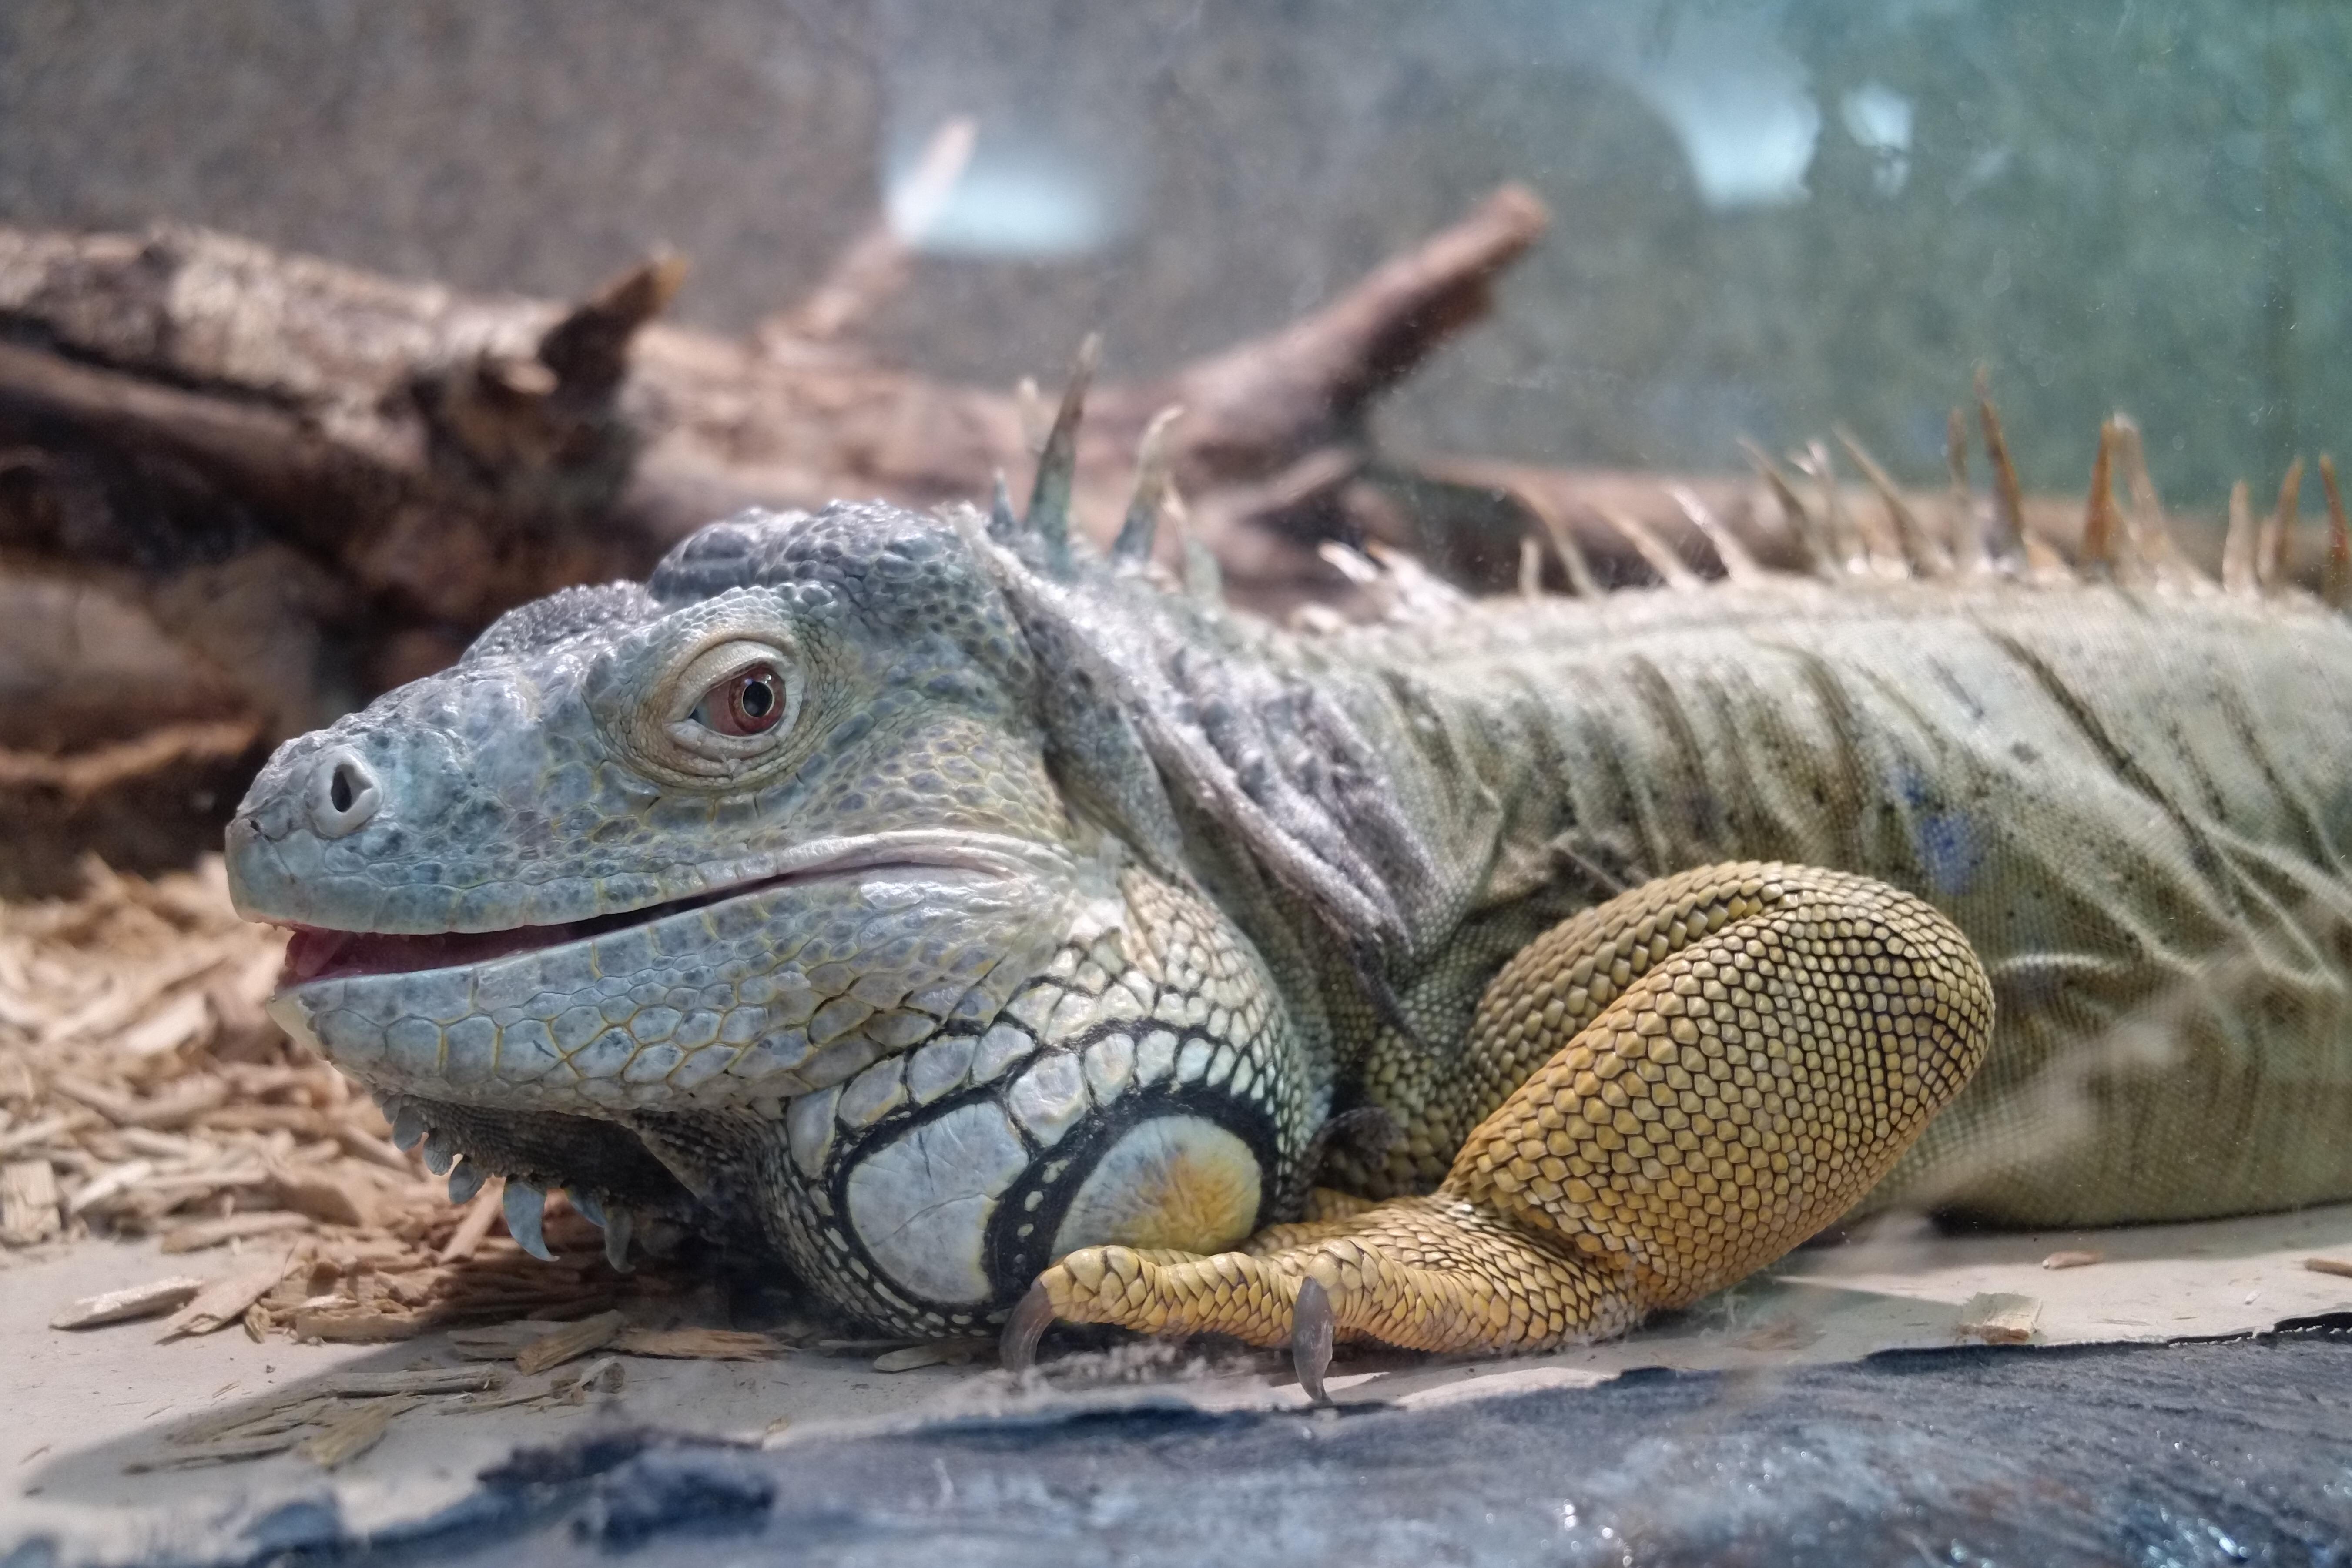 Posing iguana